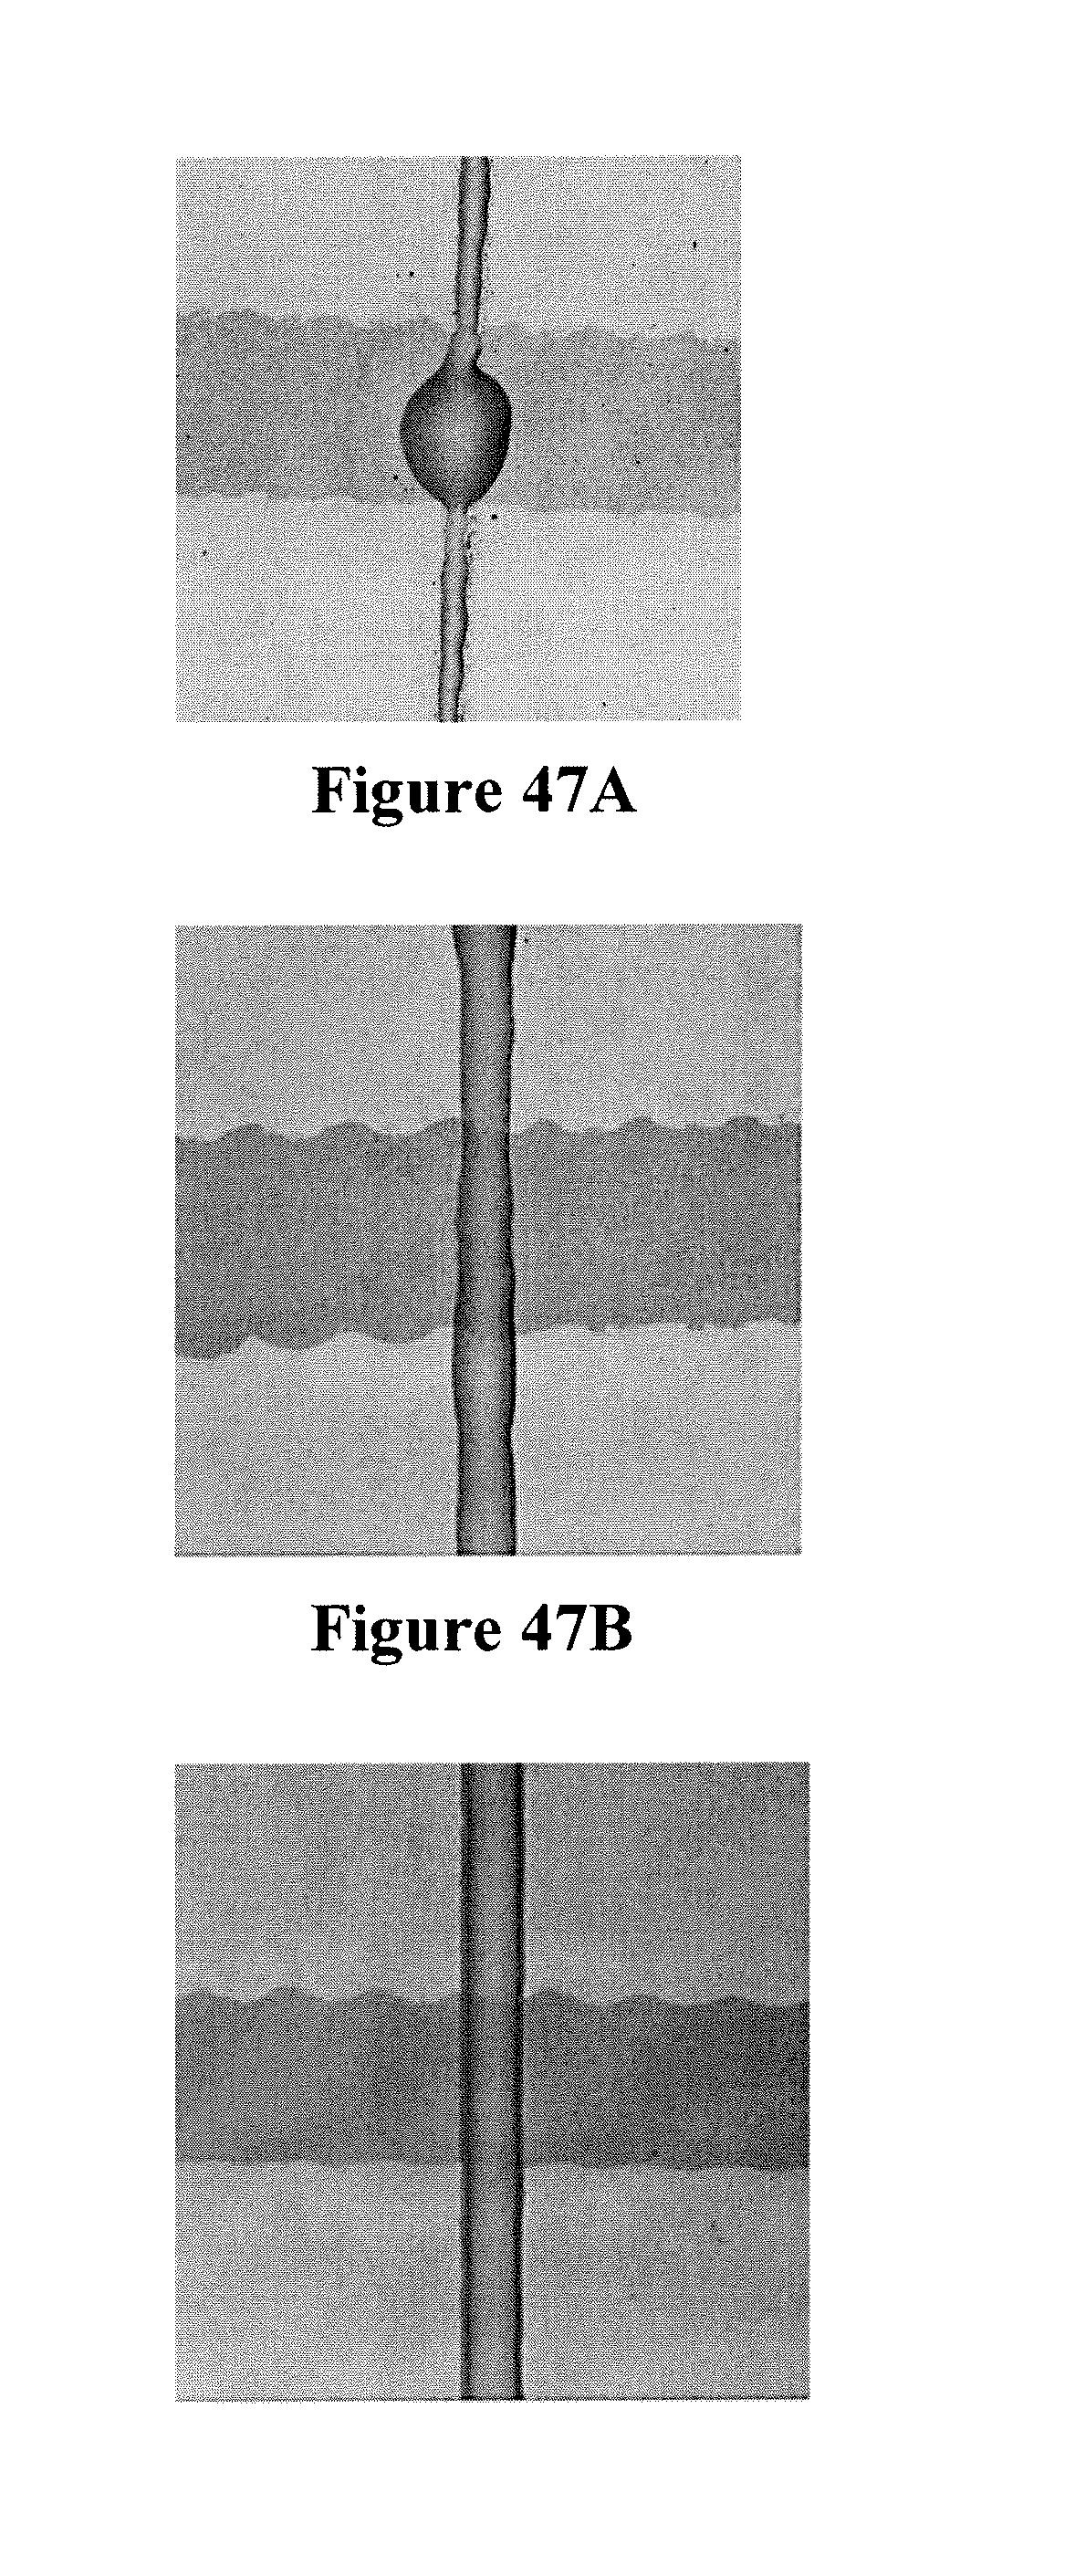 Optomec Aerosol Jet metal deposition for Printed Electronics